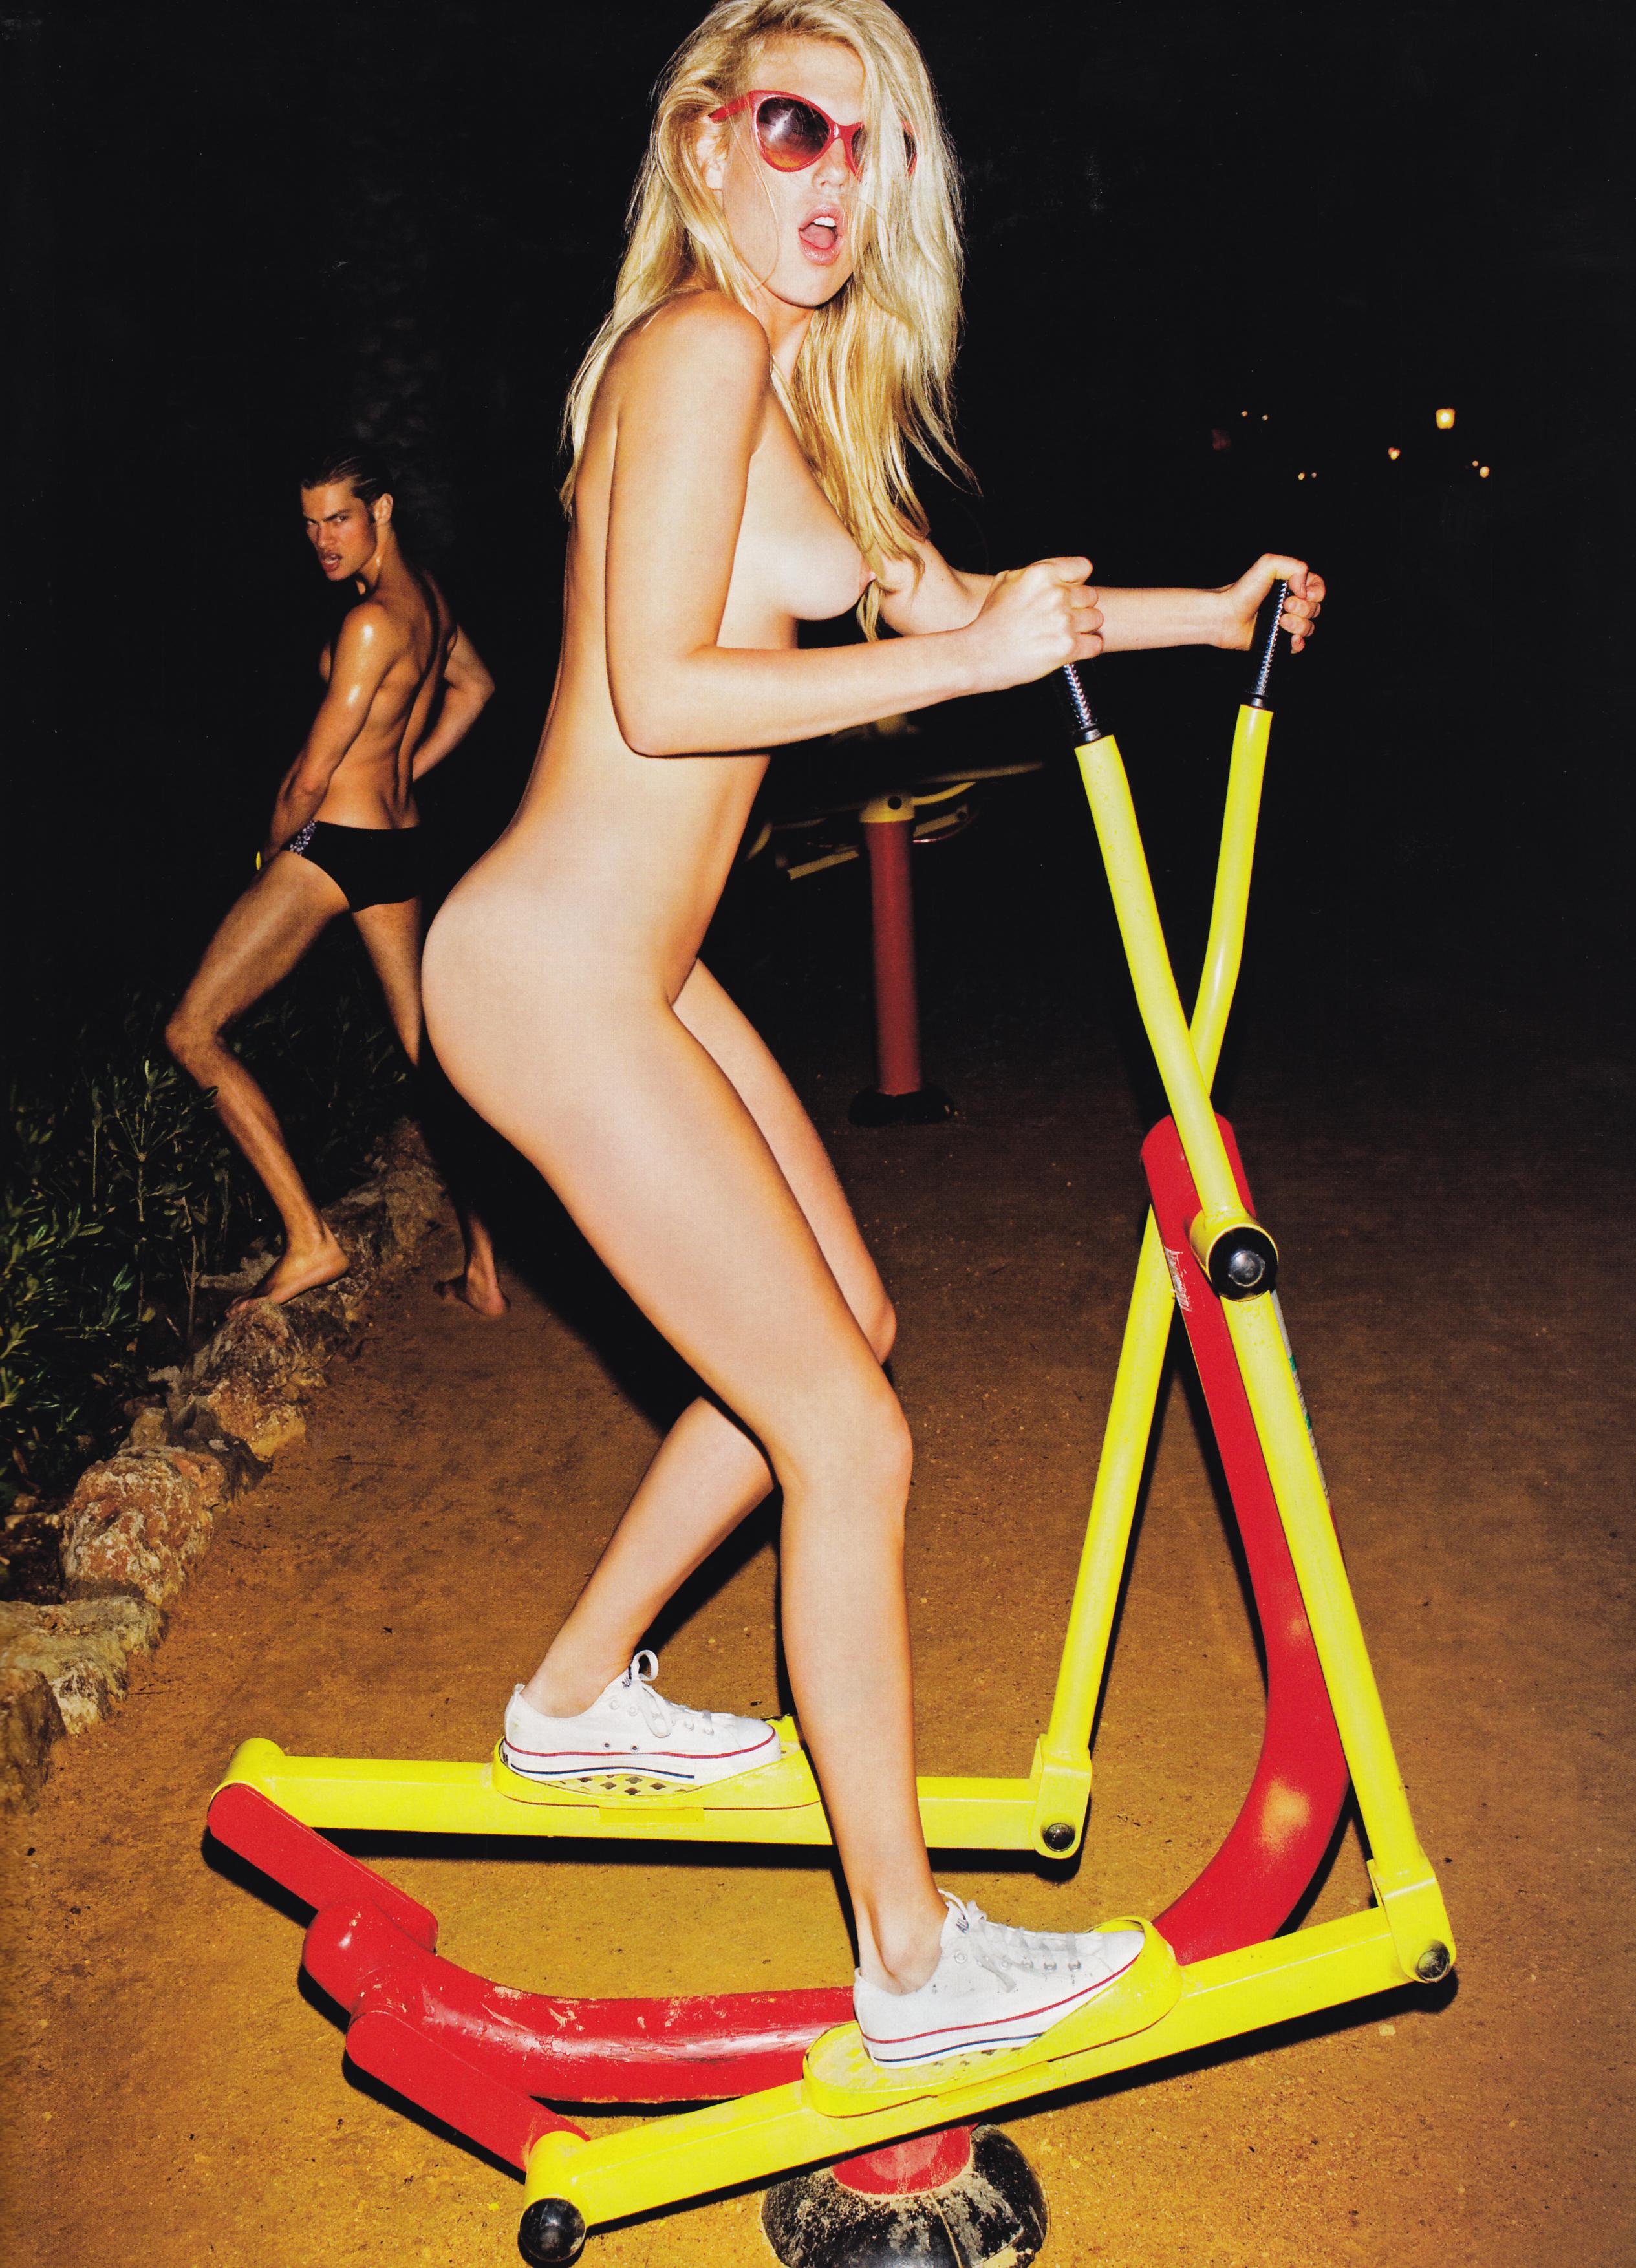 Denise richards nude photos naked sex pics